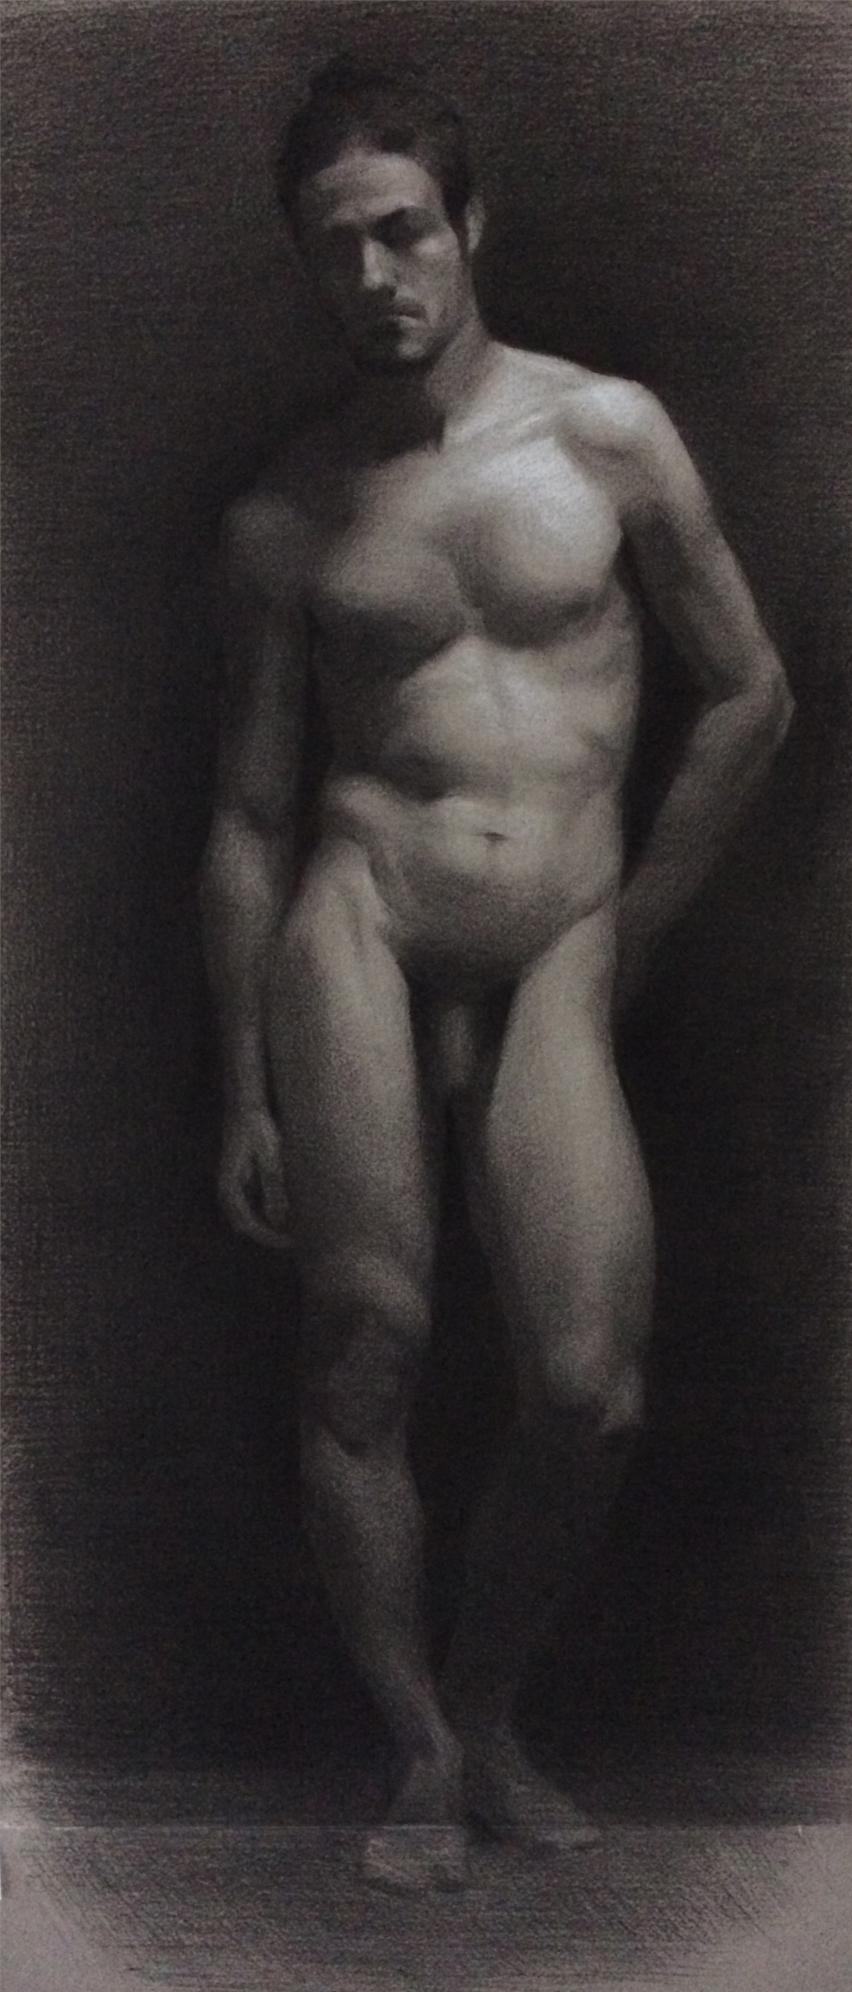 Ray desnudo mascuino - Gerard Millet (Lehrer)